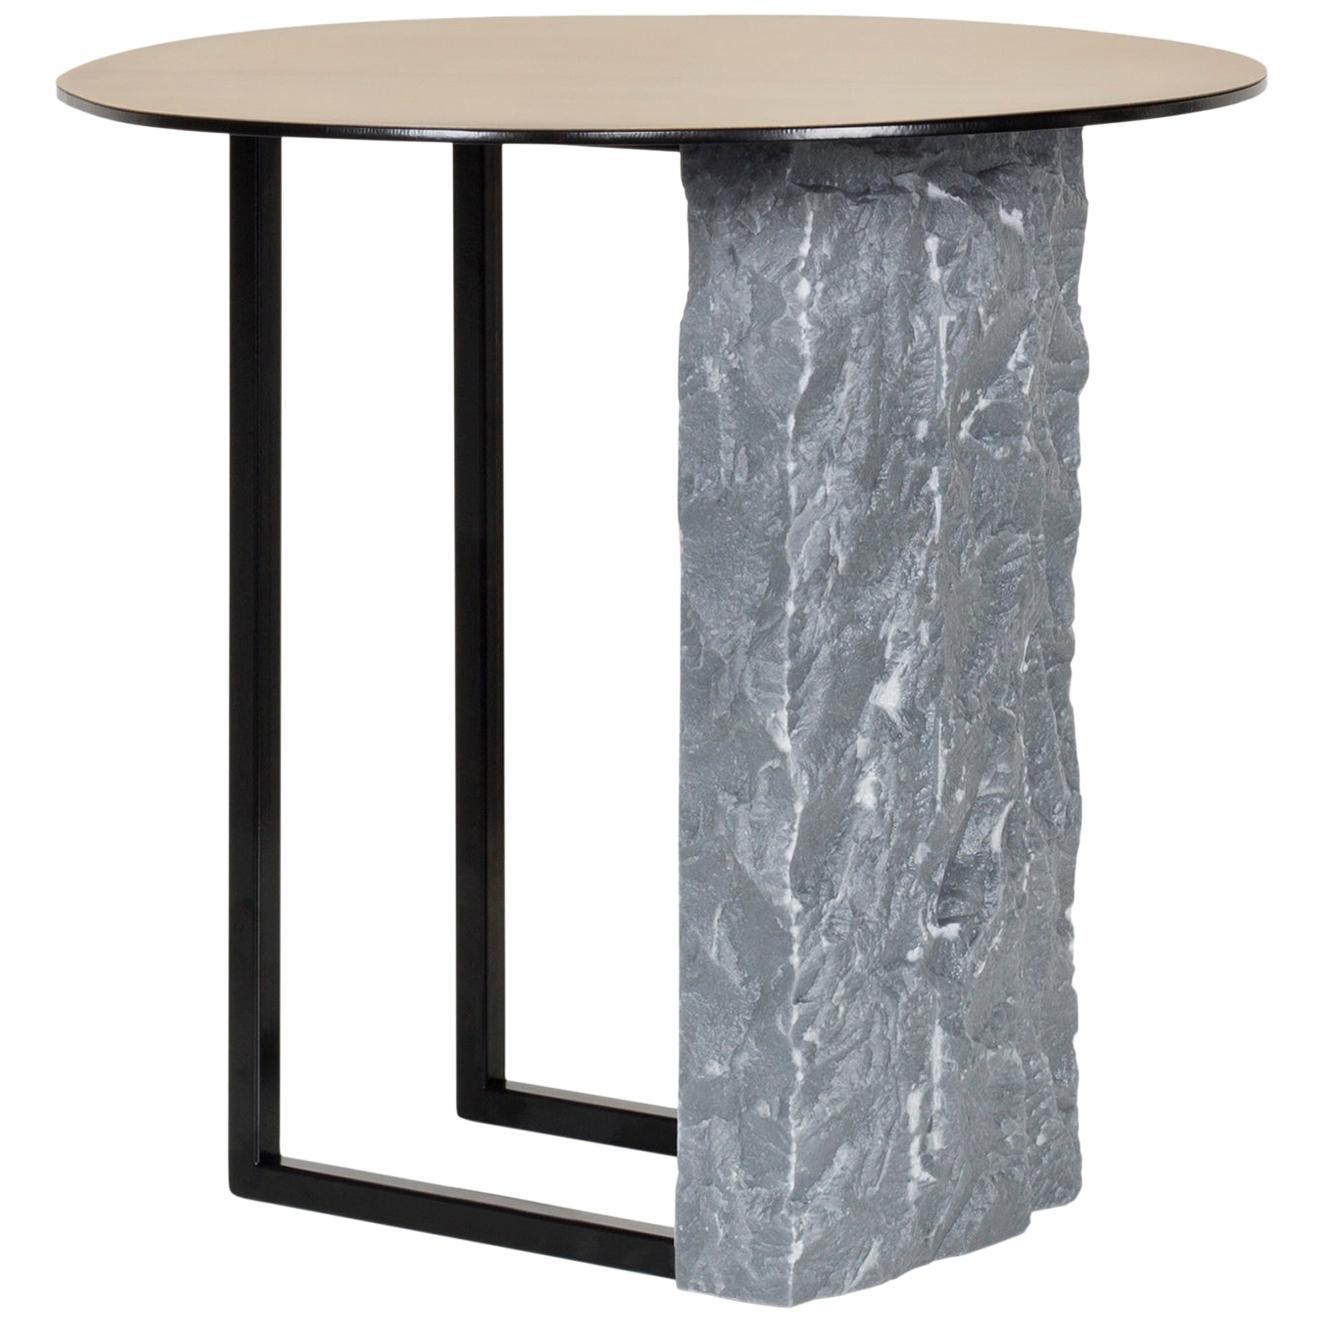 Aire Side Table L Bardiglio Marble Matt Finish Oxidized Brass Black Lacquered